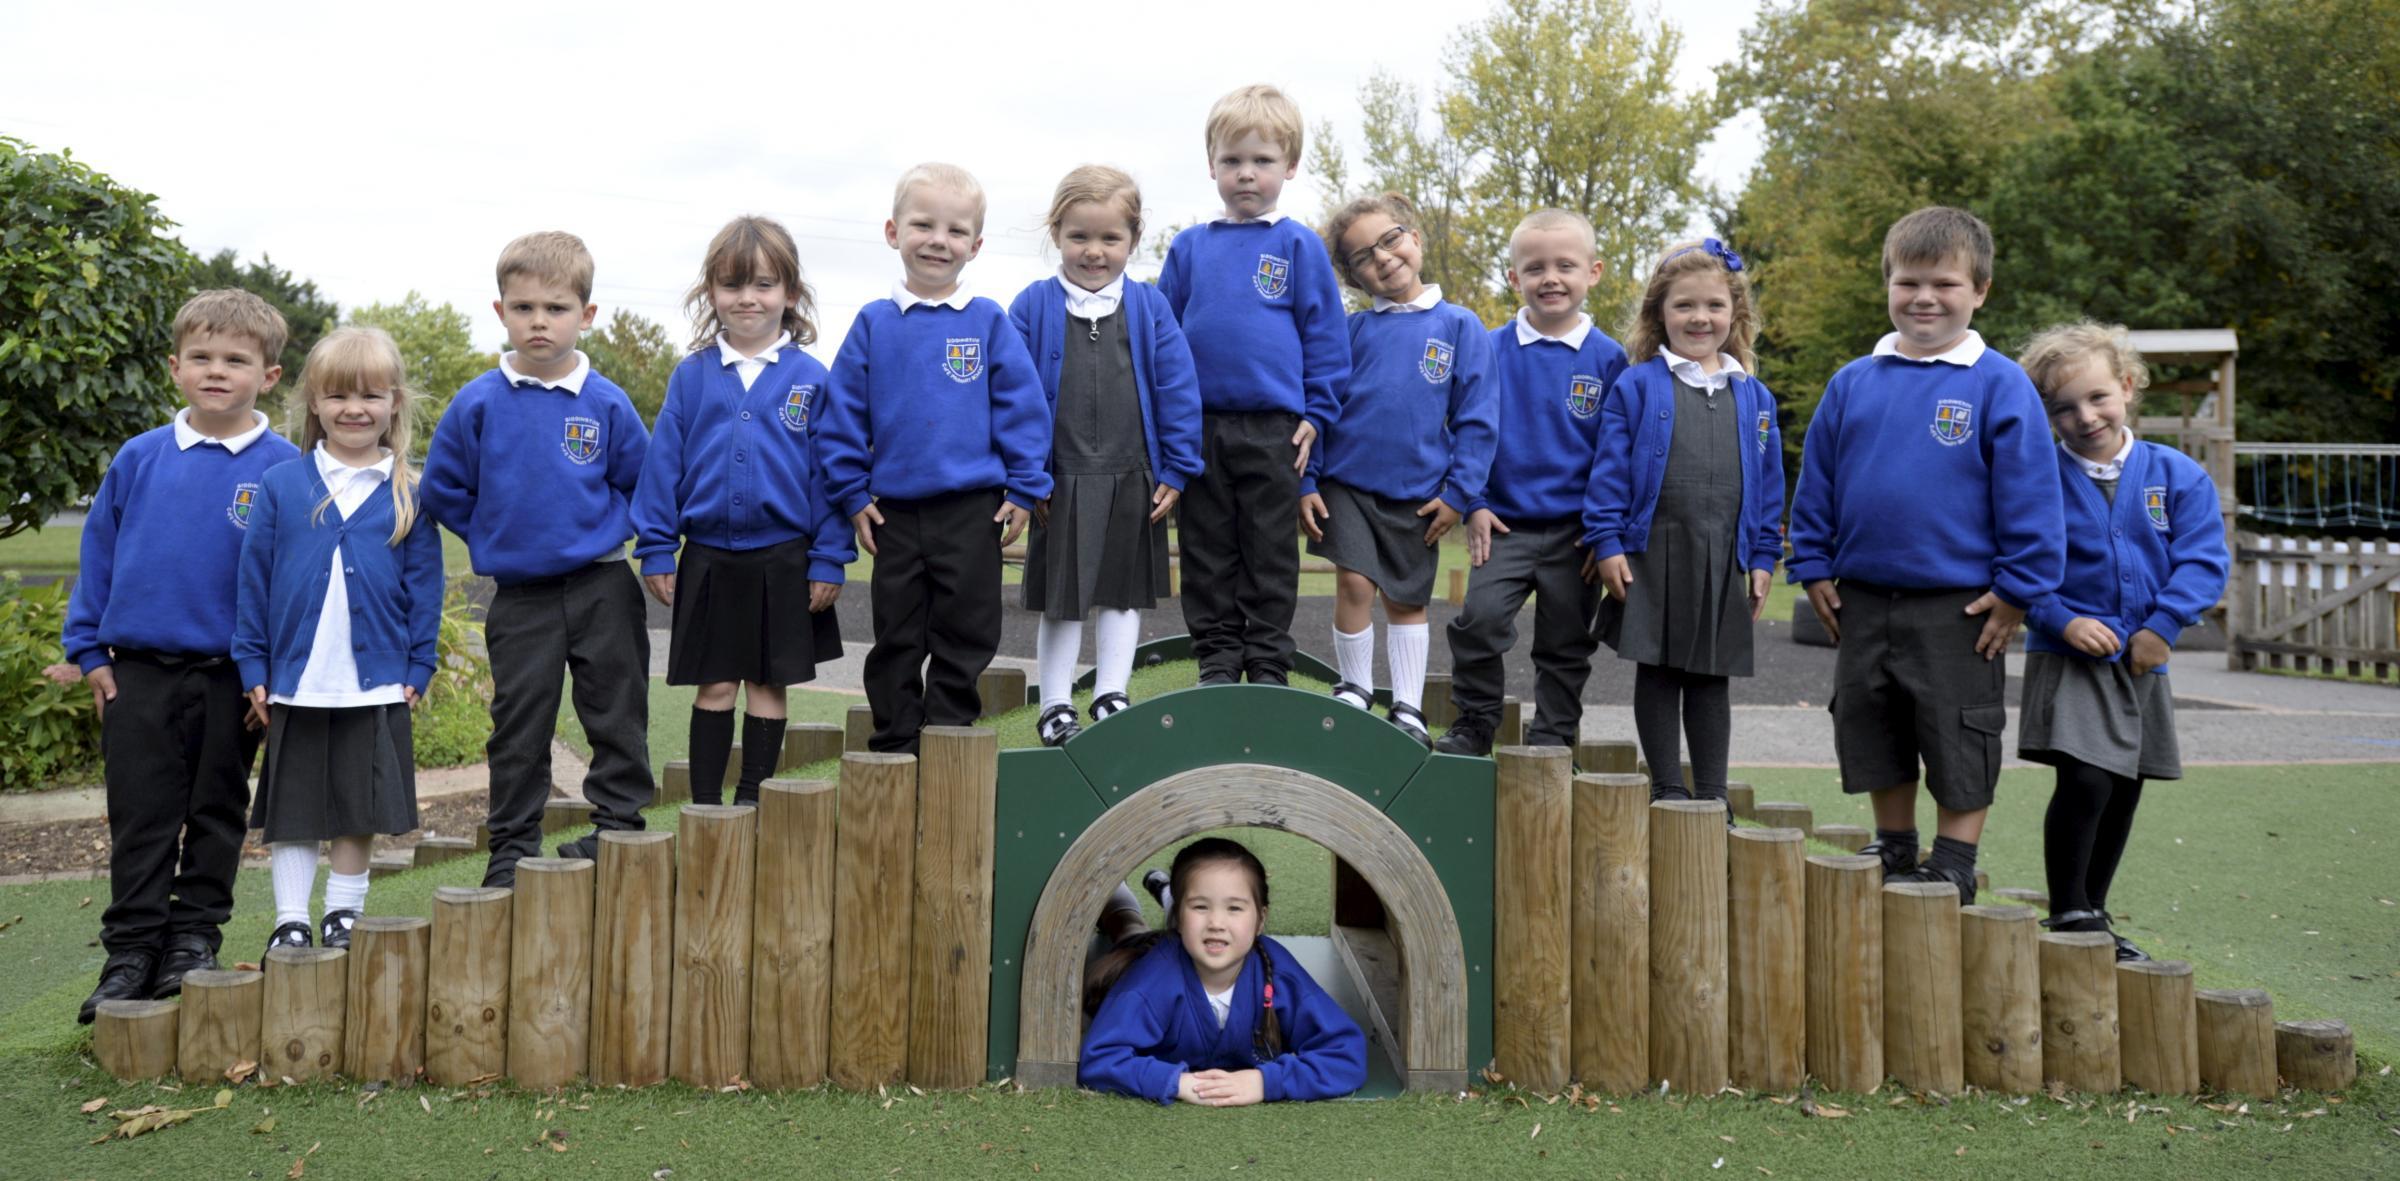 Siddington C Of E Primary School reception class photos